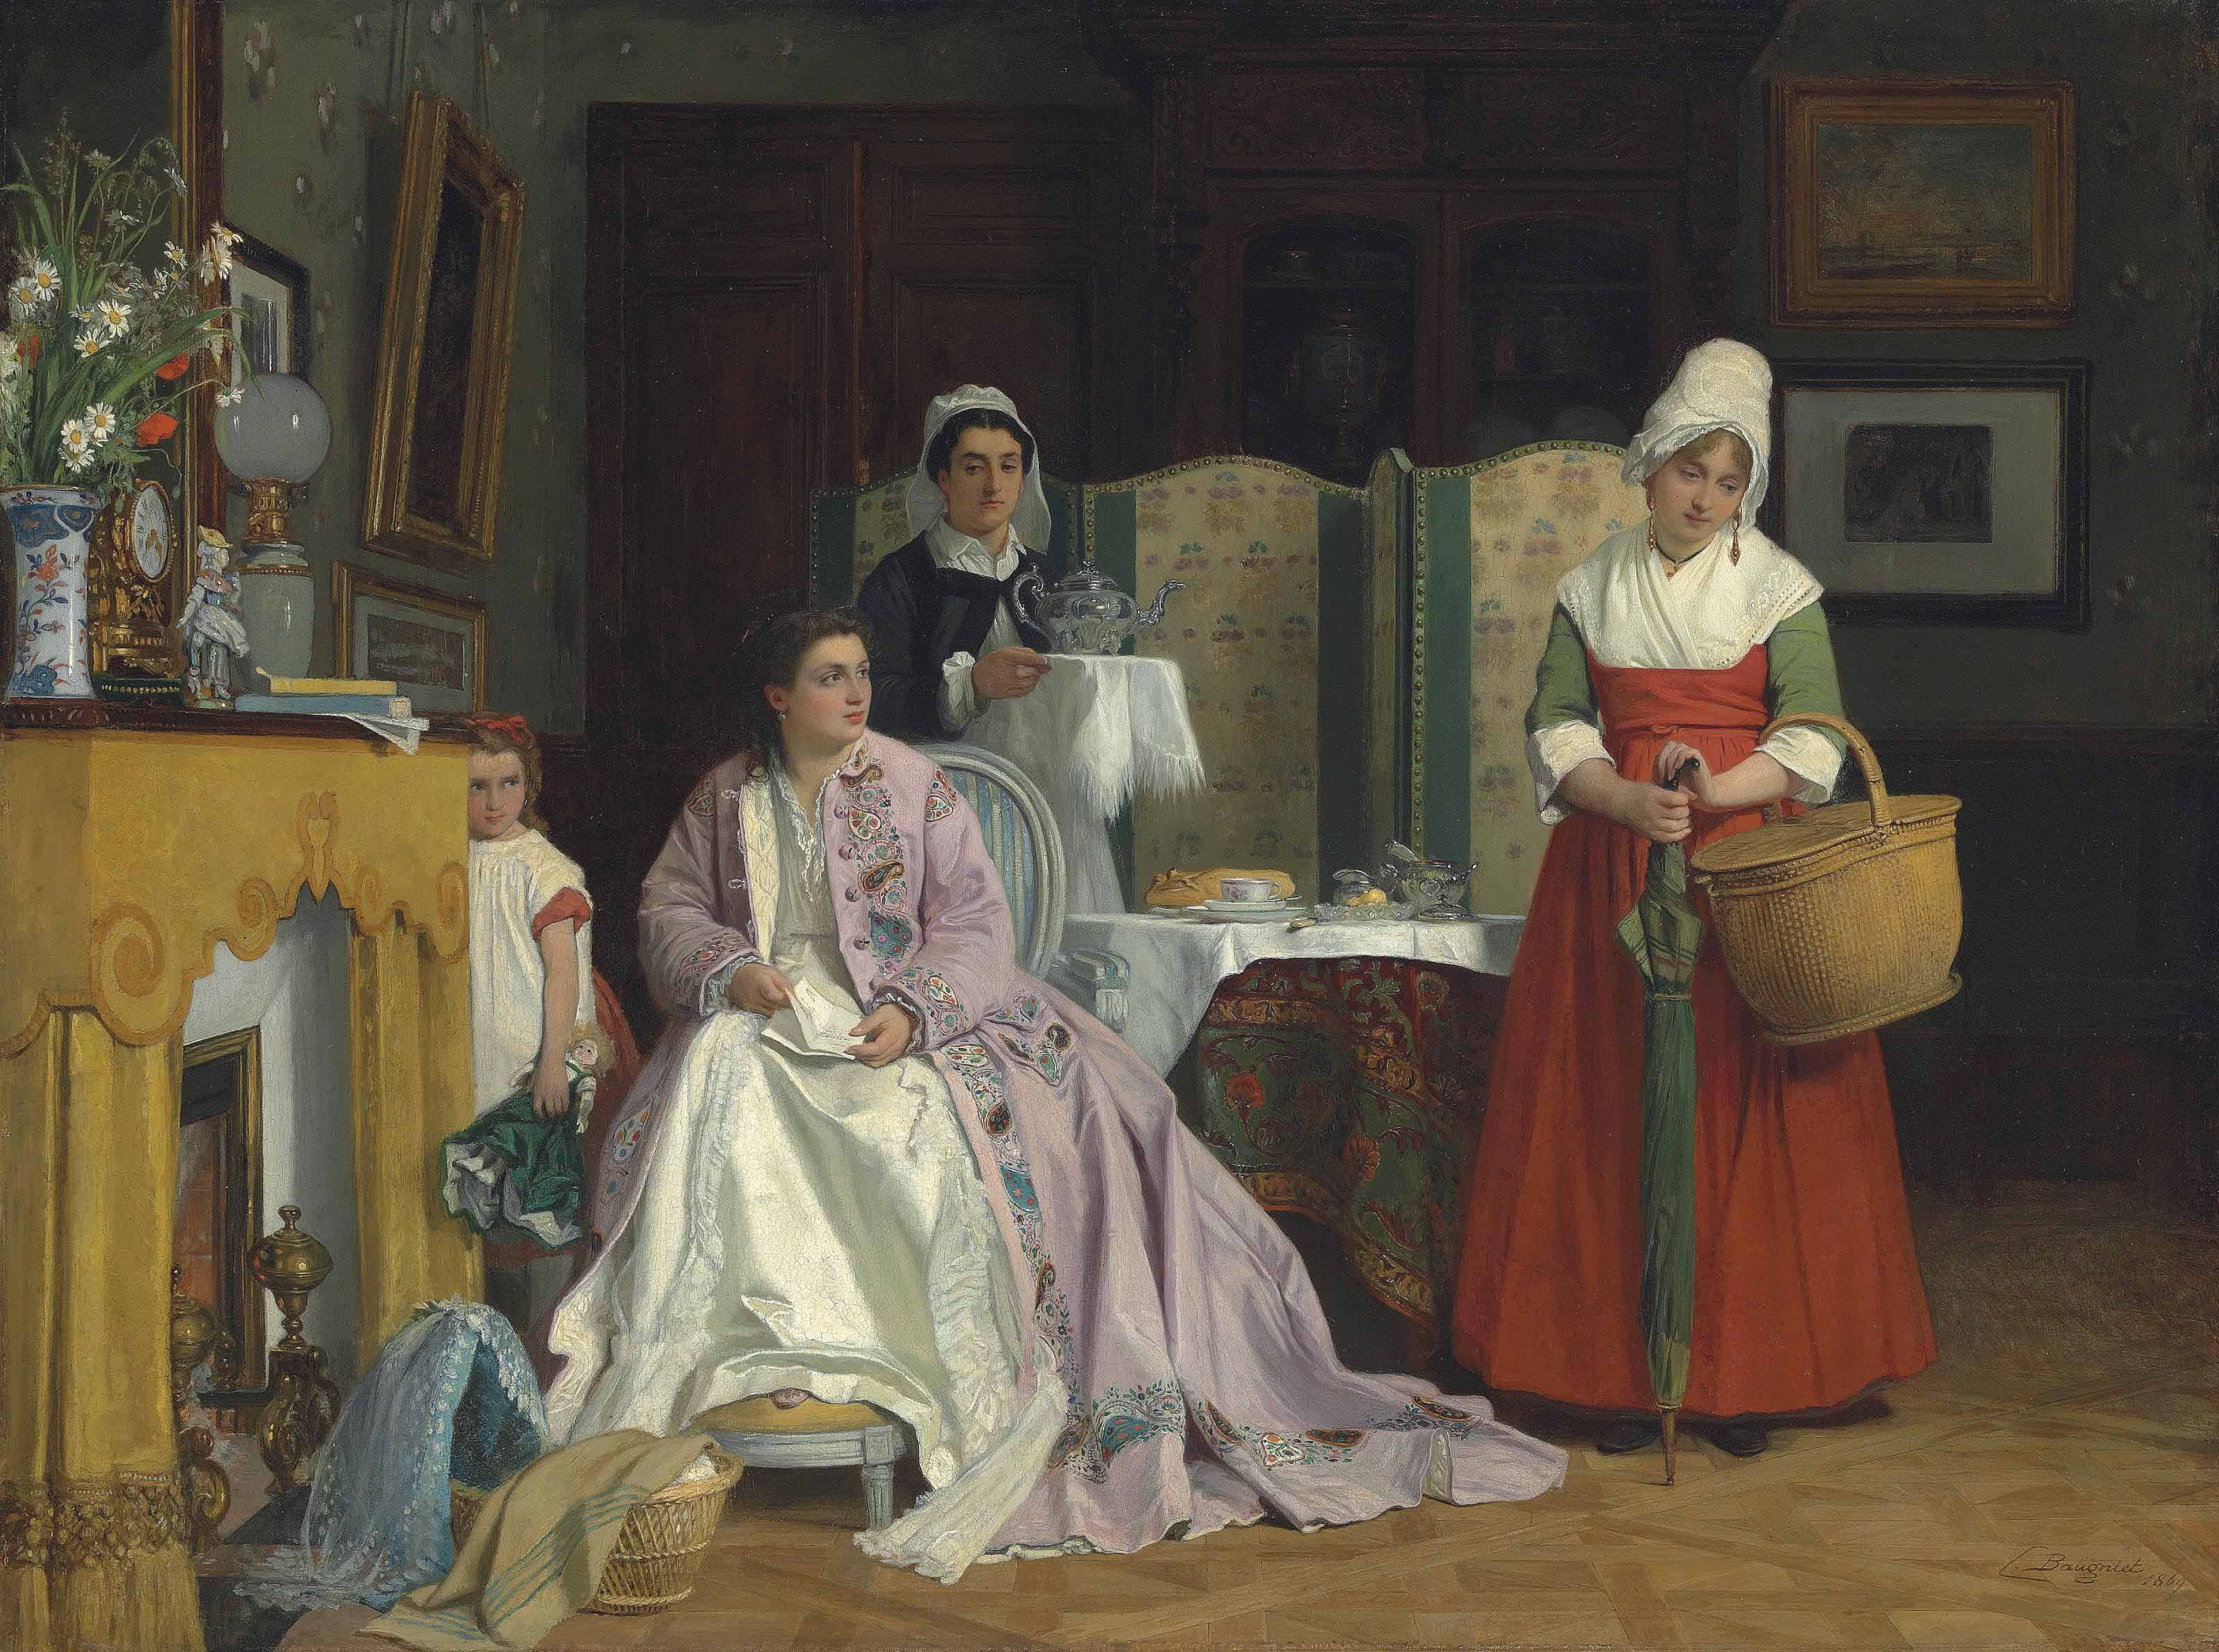 Charles-Louis Baugniet (Belgian, 1814-1886)